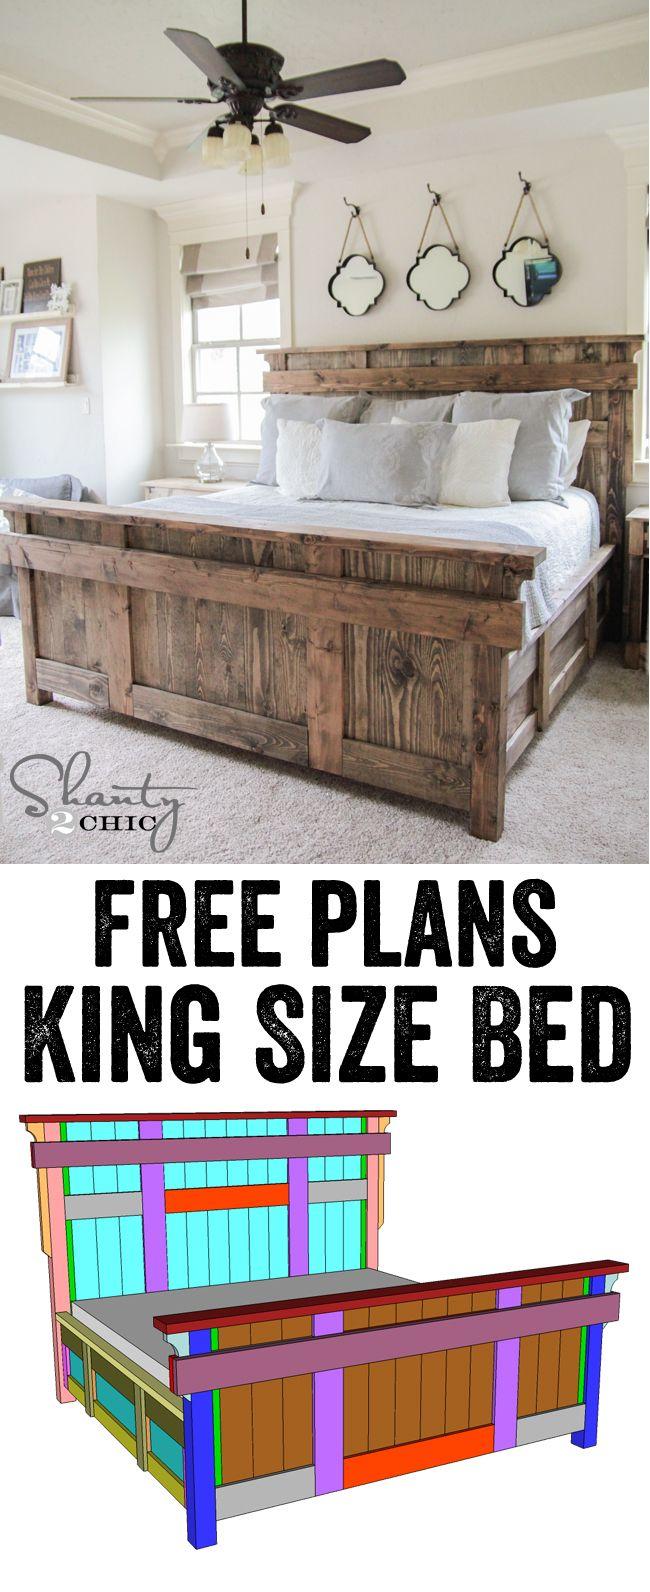 Rustic chic bedroom pinterest - Diy King Size Bed Free Plans Rustic Furniturebedroom